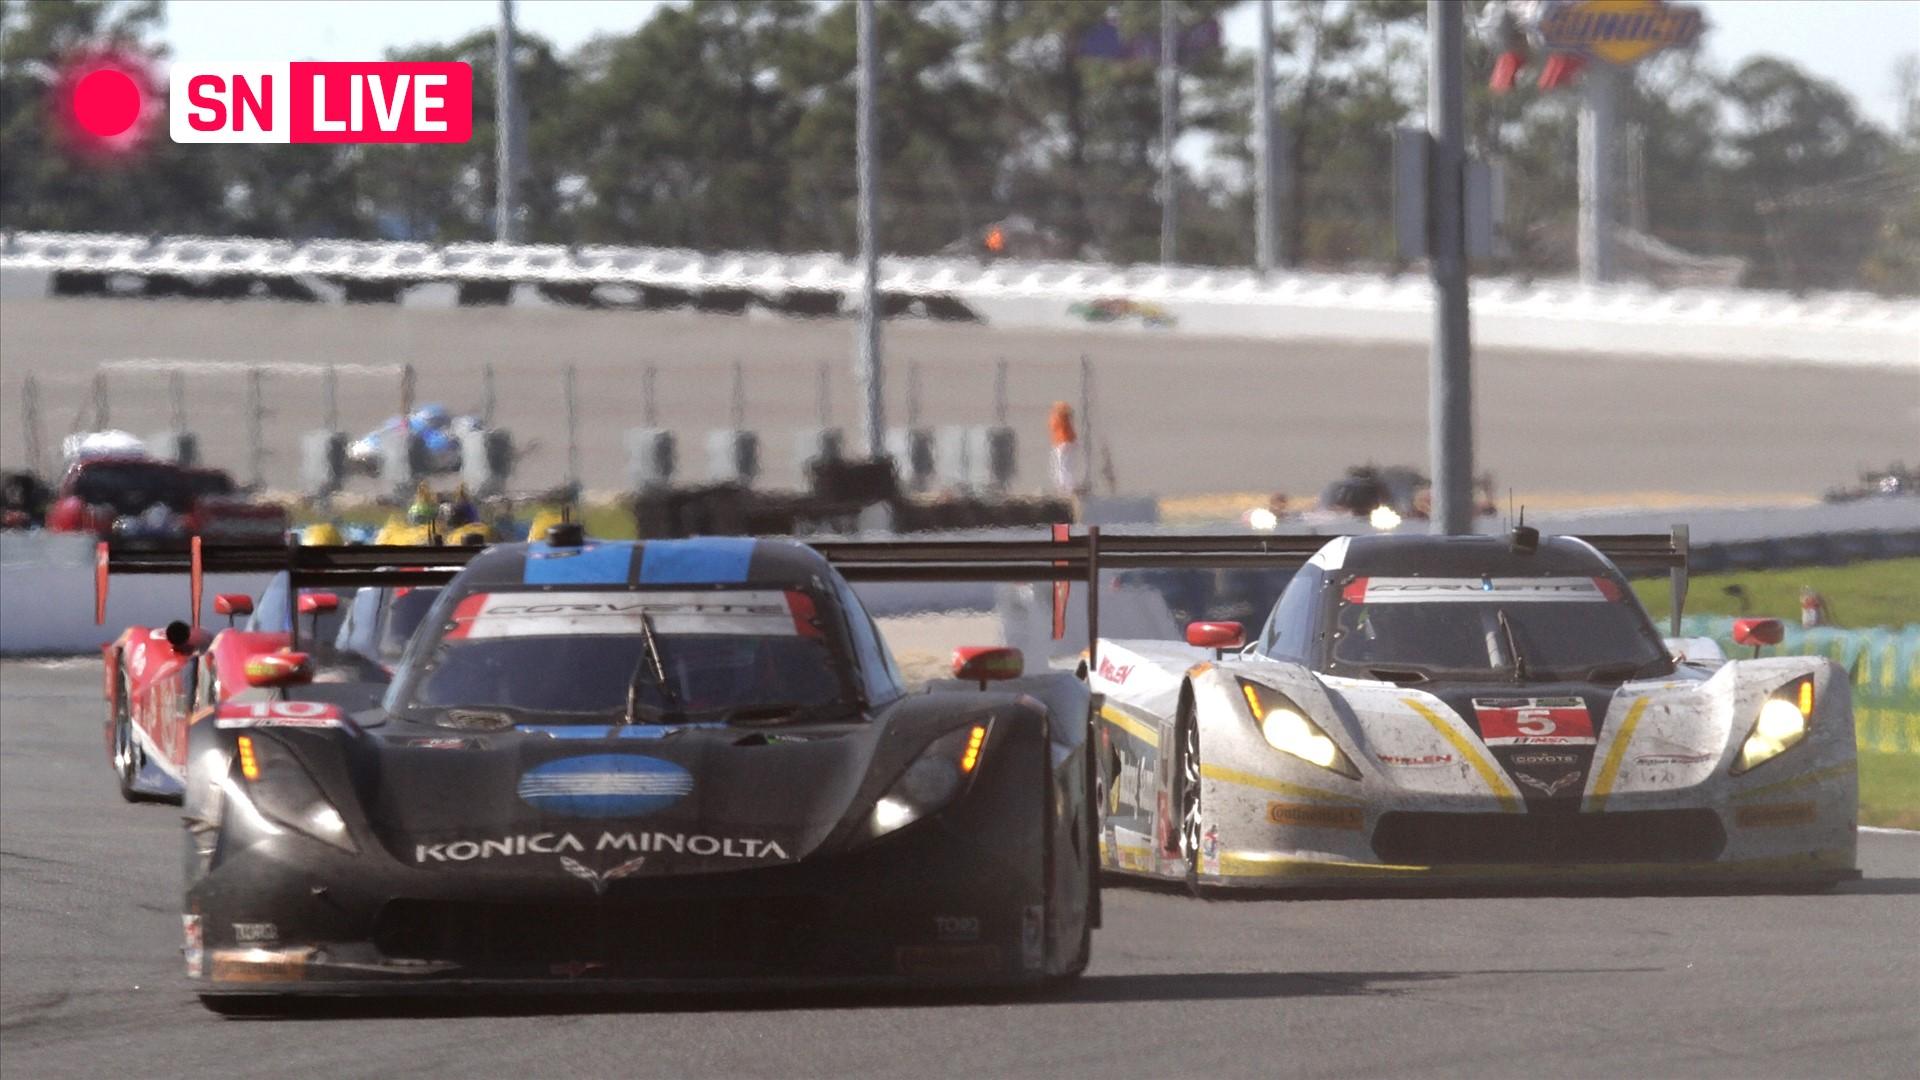 Rolex 24 at Daytona 2020 Live stream, standings, updates